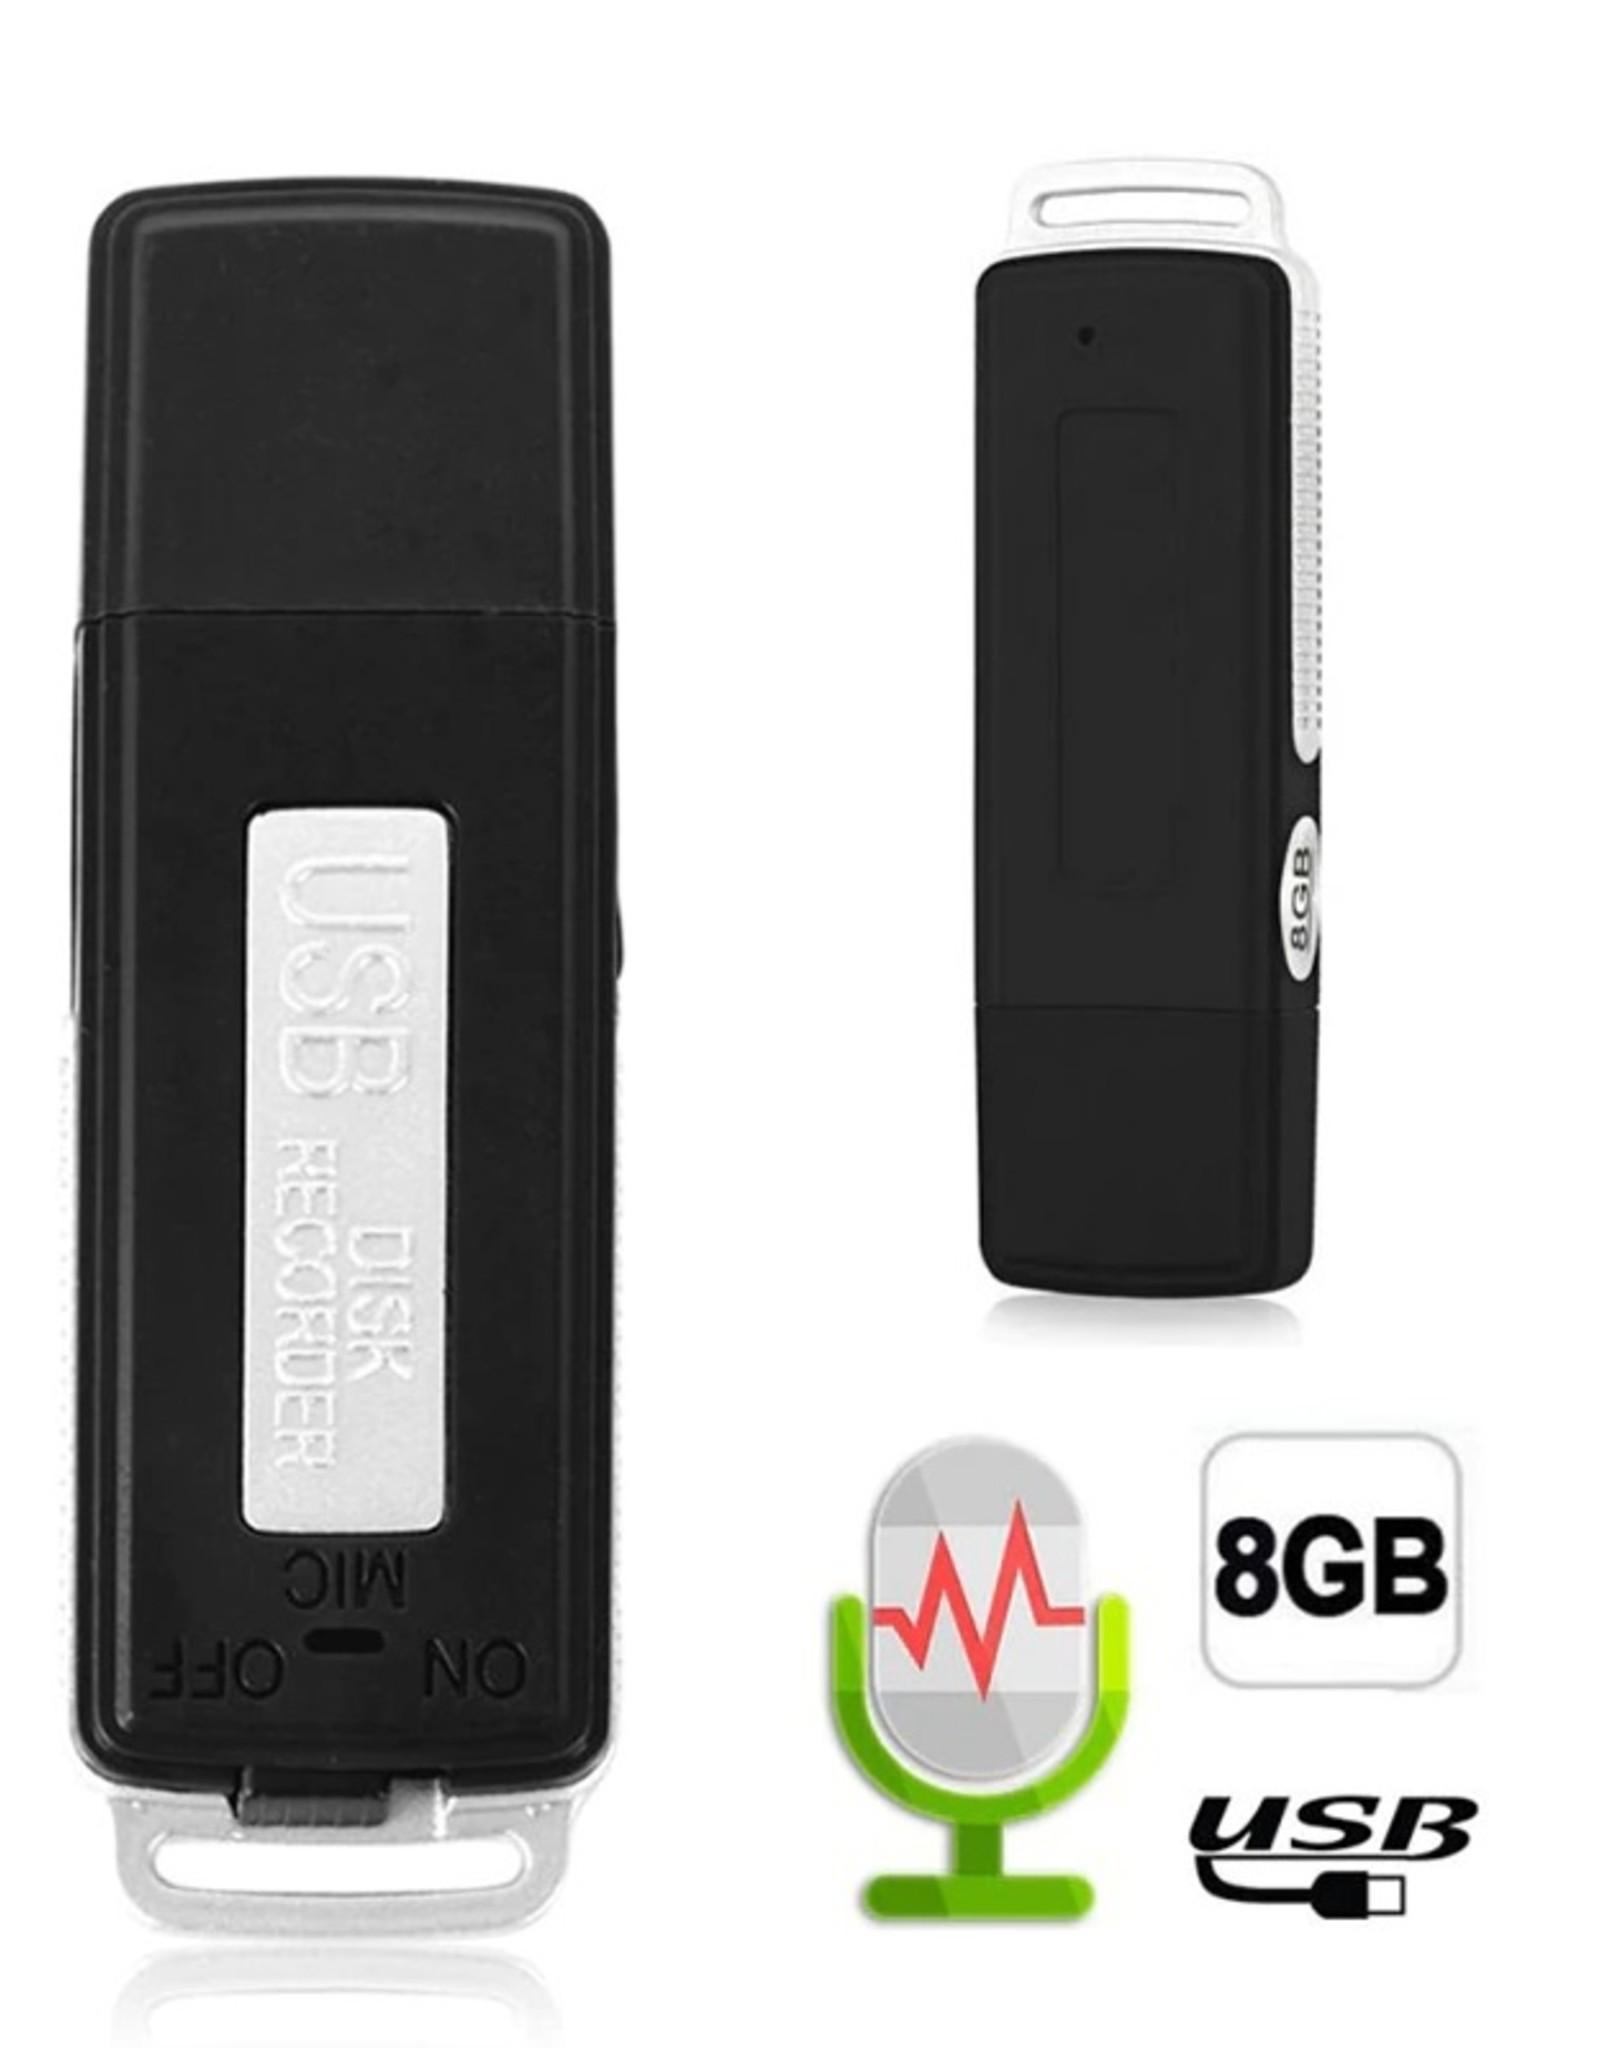 2 in 1 Mini 8GB USB Pen Flash Drive Schijf Digitale Audio Voice Recorder 70 Uur Draagbare Mini Opname Dictafoon